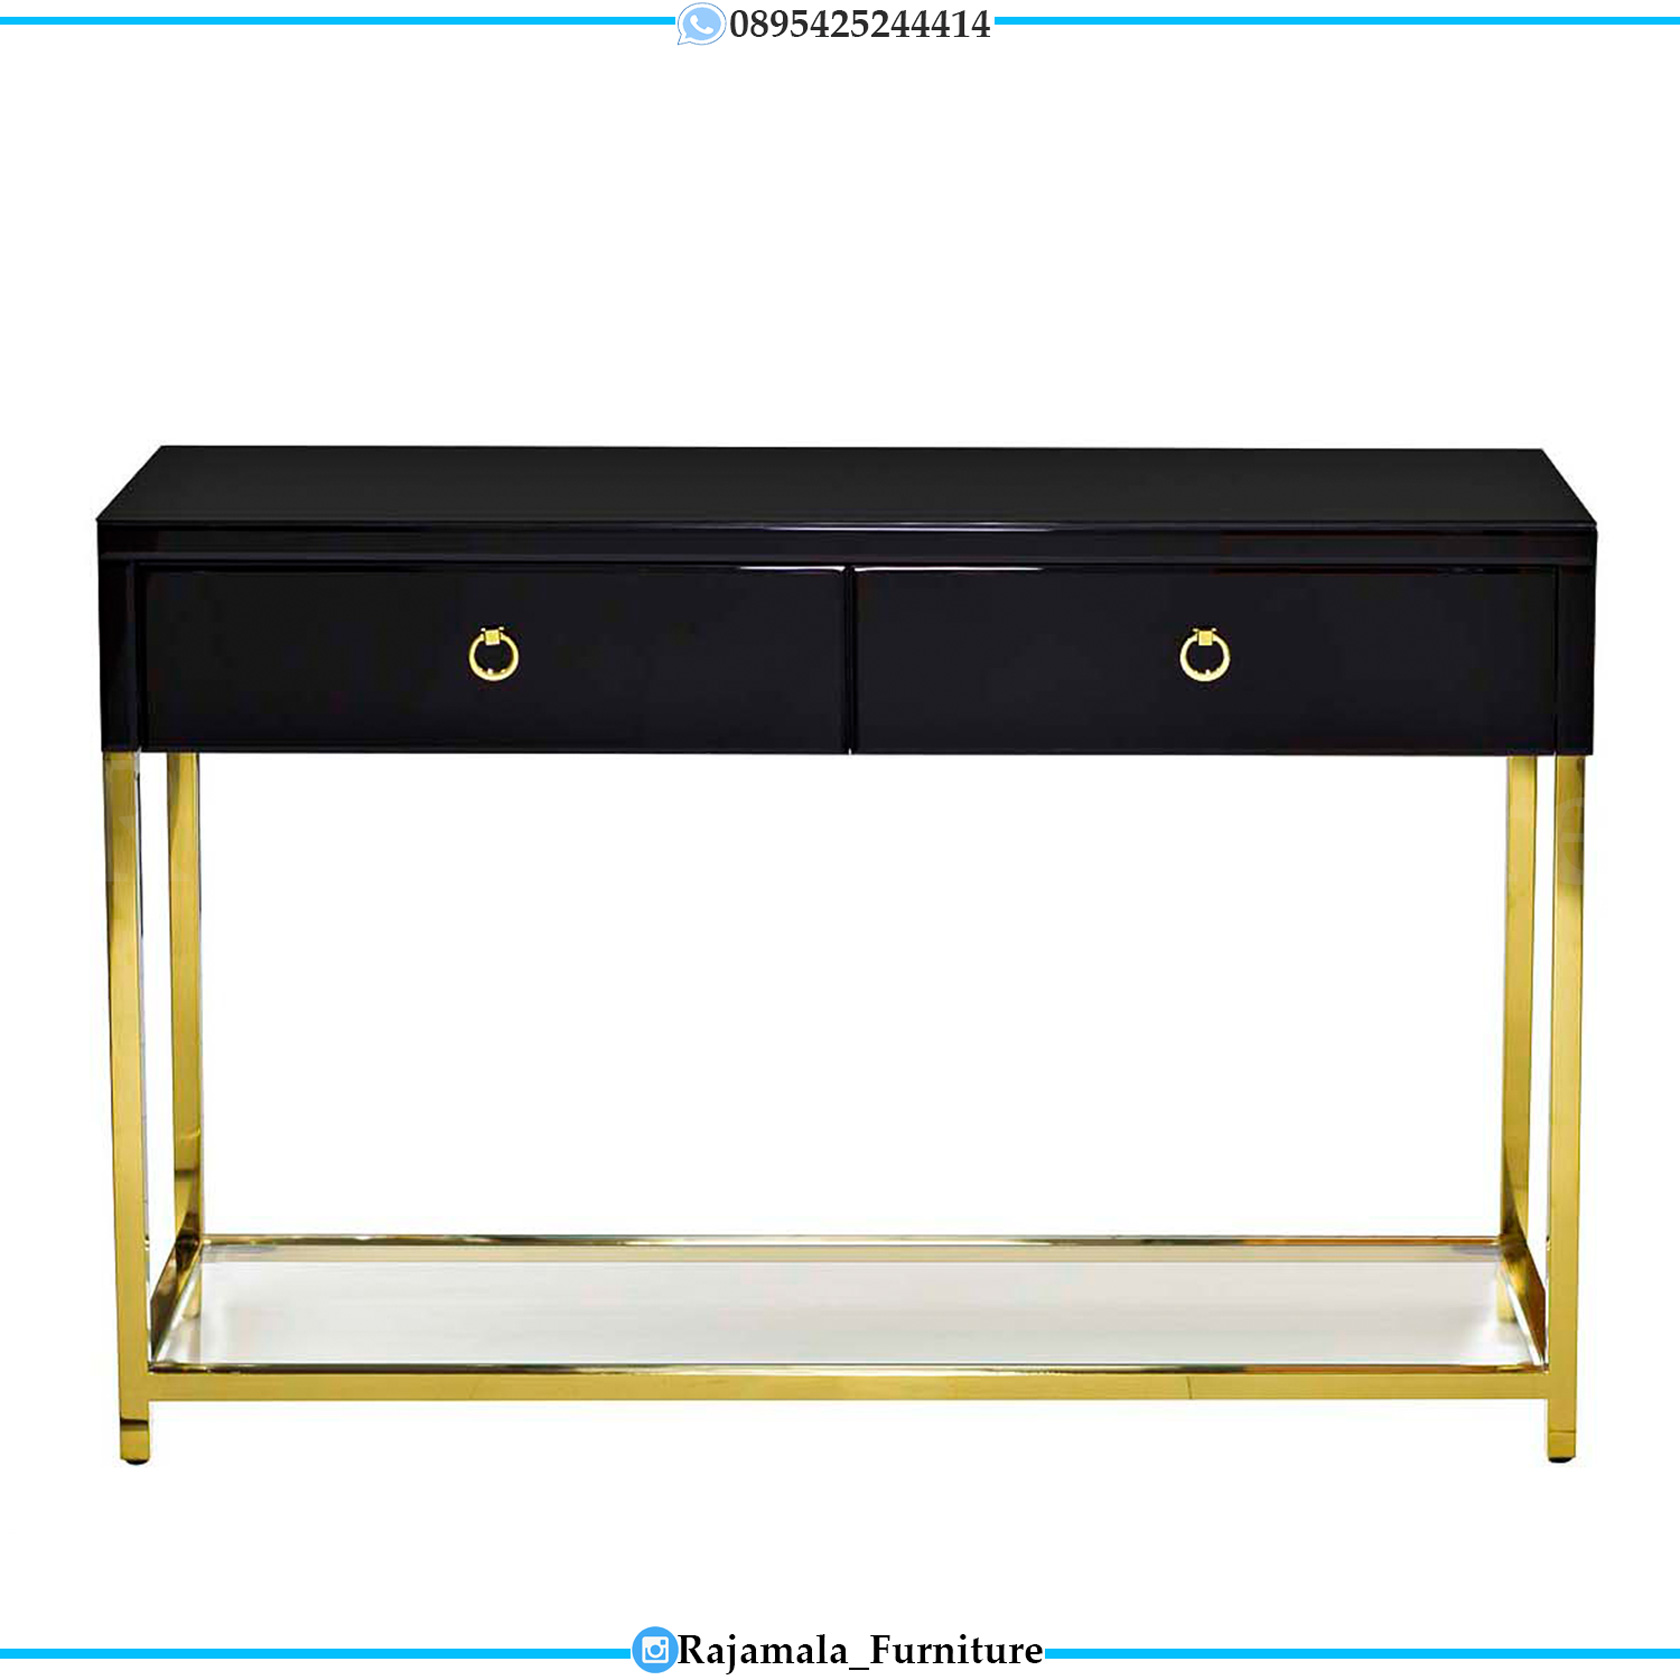 Desain Meja Konsul Minimalis Terbaru Stainless Steal Luxury Color RM-0287